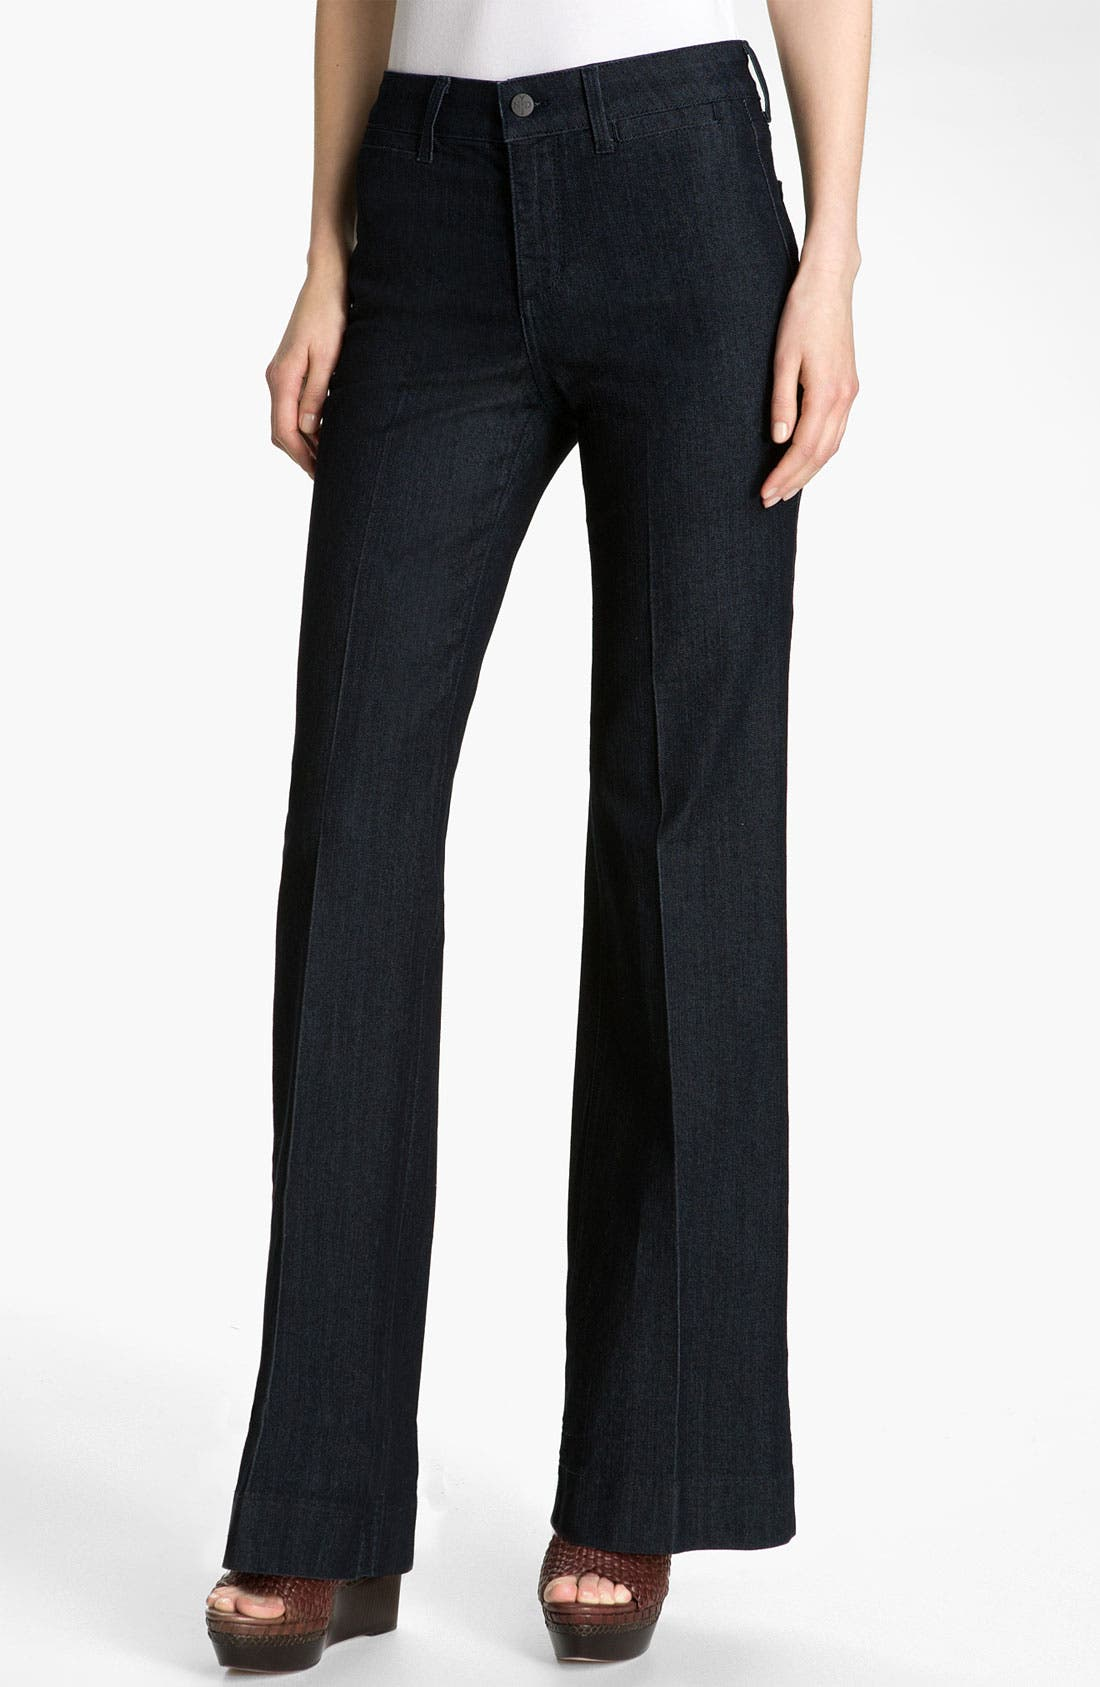 Main Image - NYDJ 'Greta' Trouser Jeans